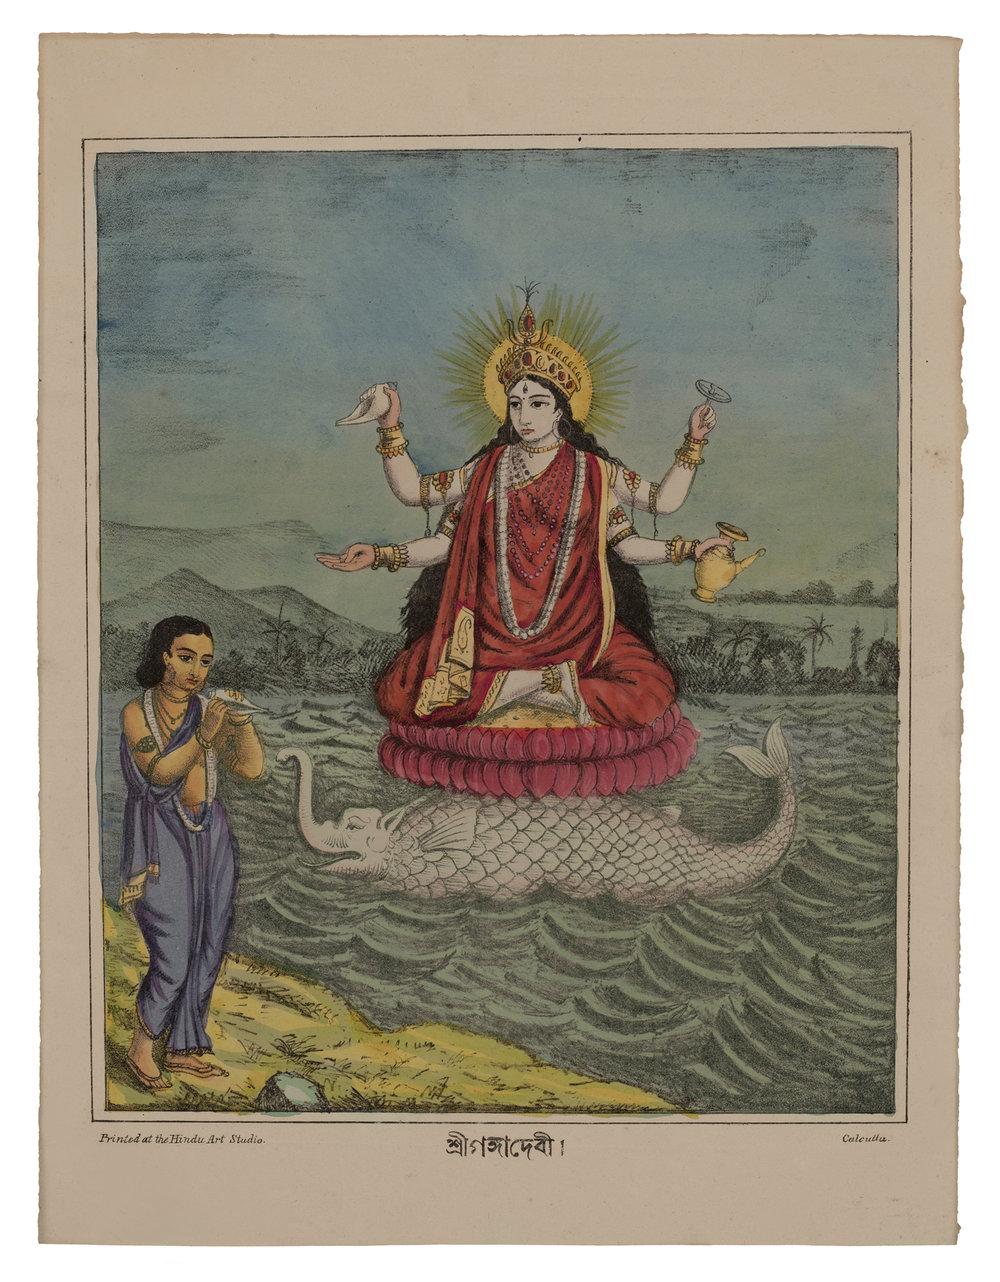 Sri Ganga Devi, c. 1880